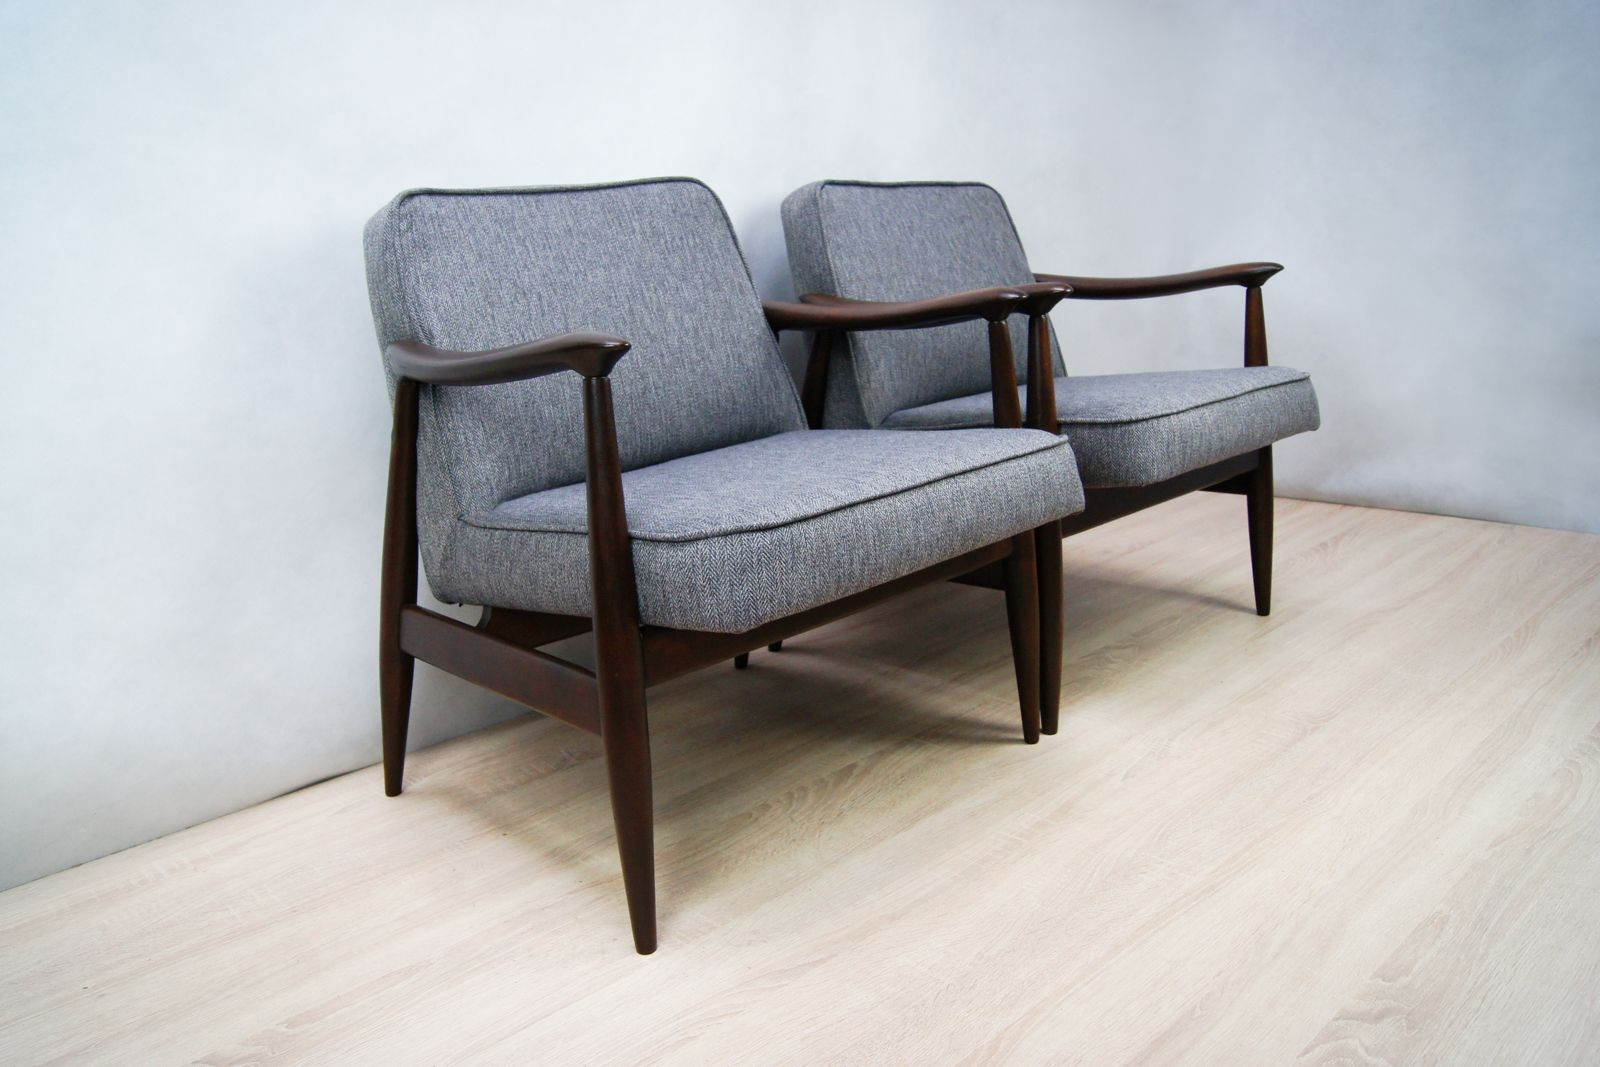 Mid century gfm 87 armchairs by juliusz kedziorek for for Furniture factory